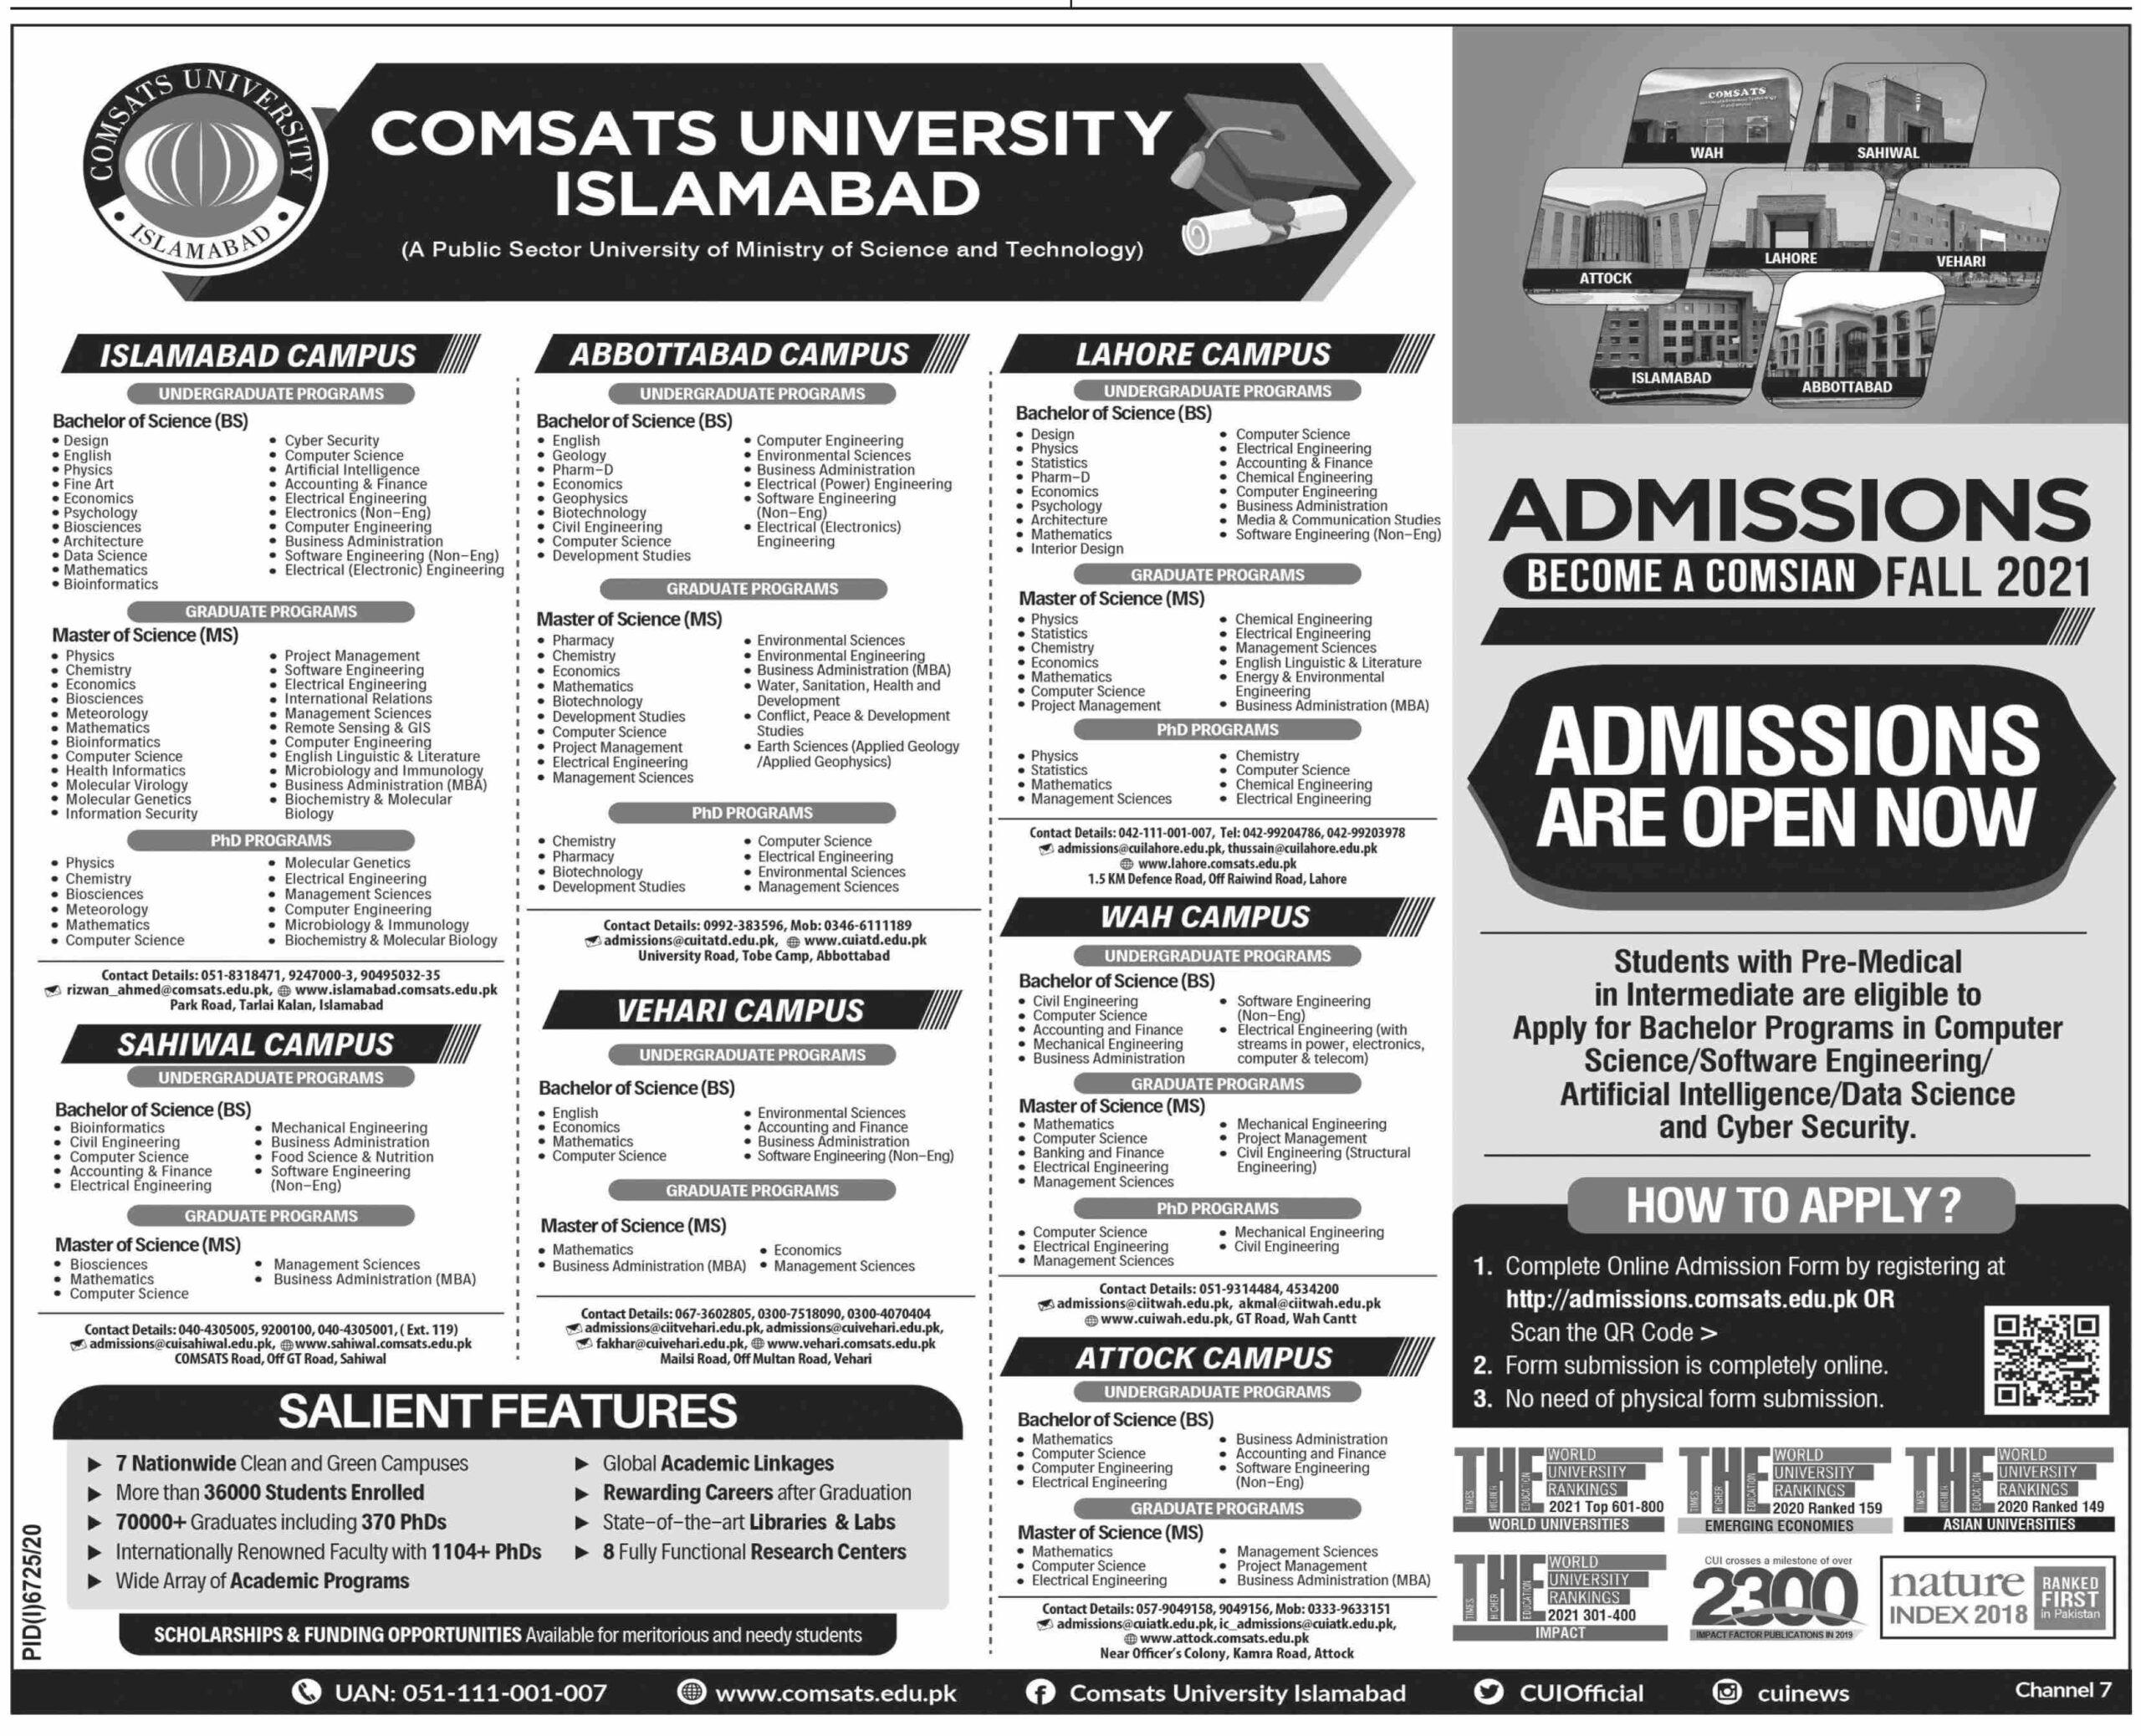 Comsats University Islamabad Admissions Undergraduate 2021